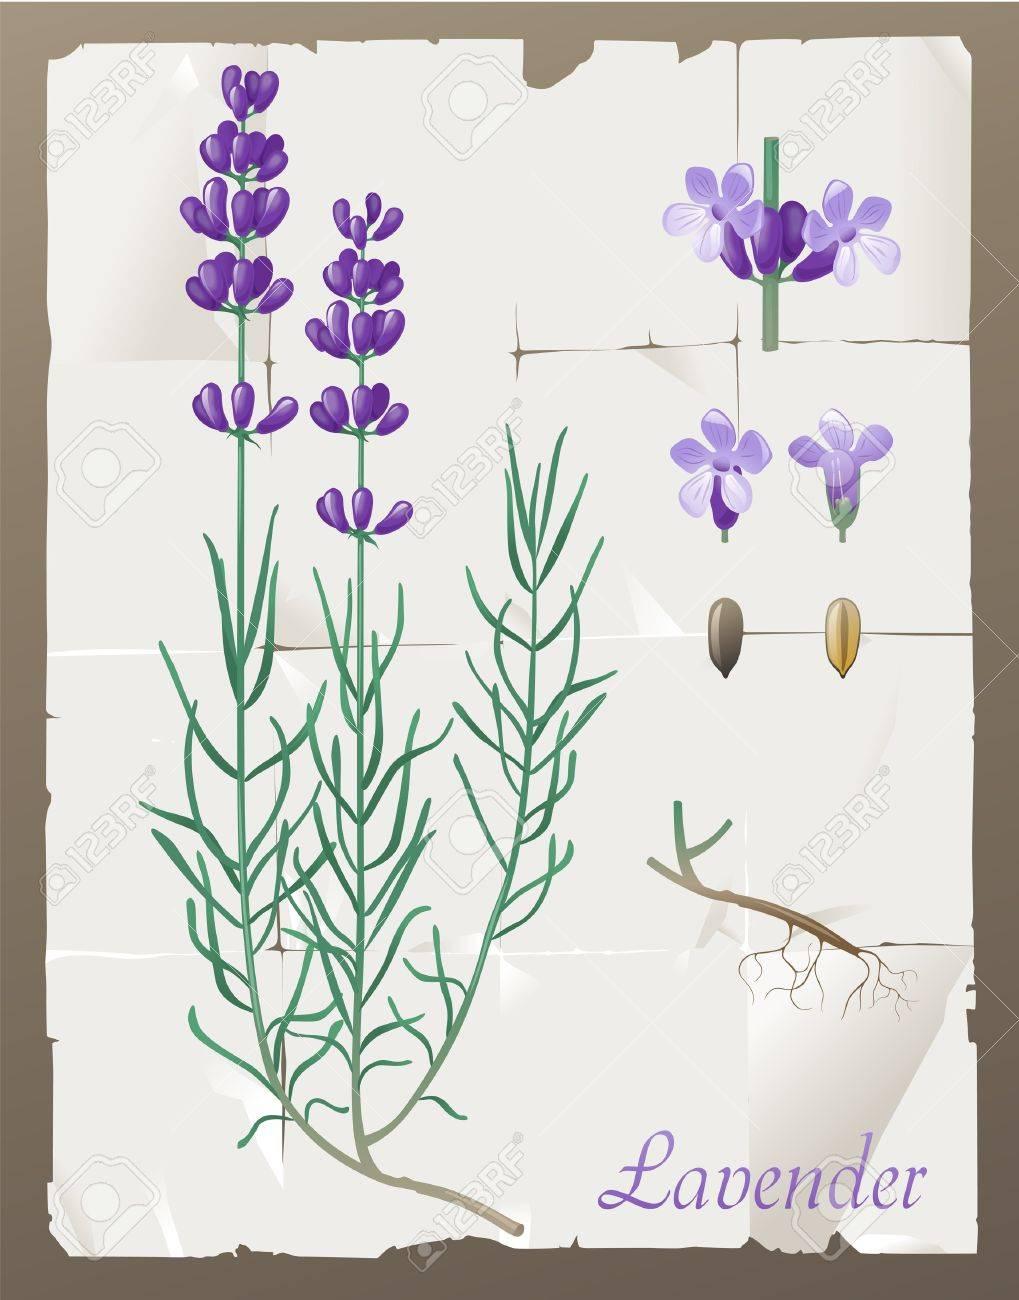 Lavender Plant Drawing Retro-styled lavender